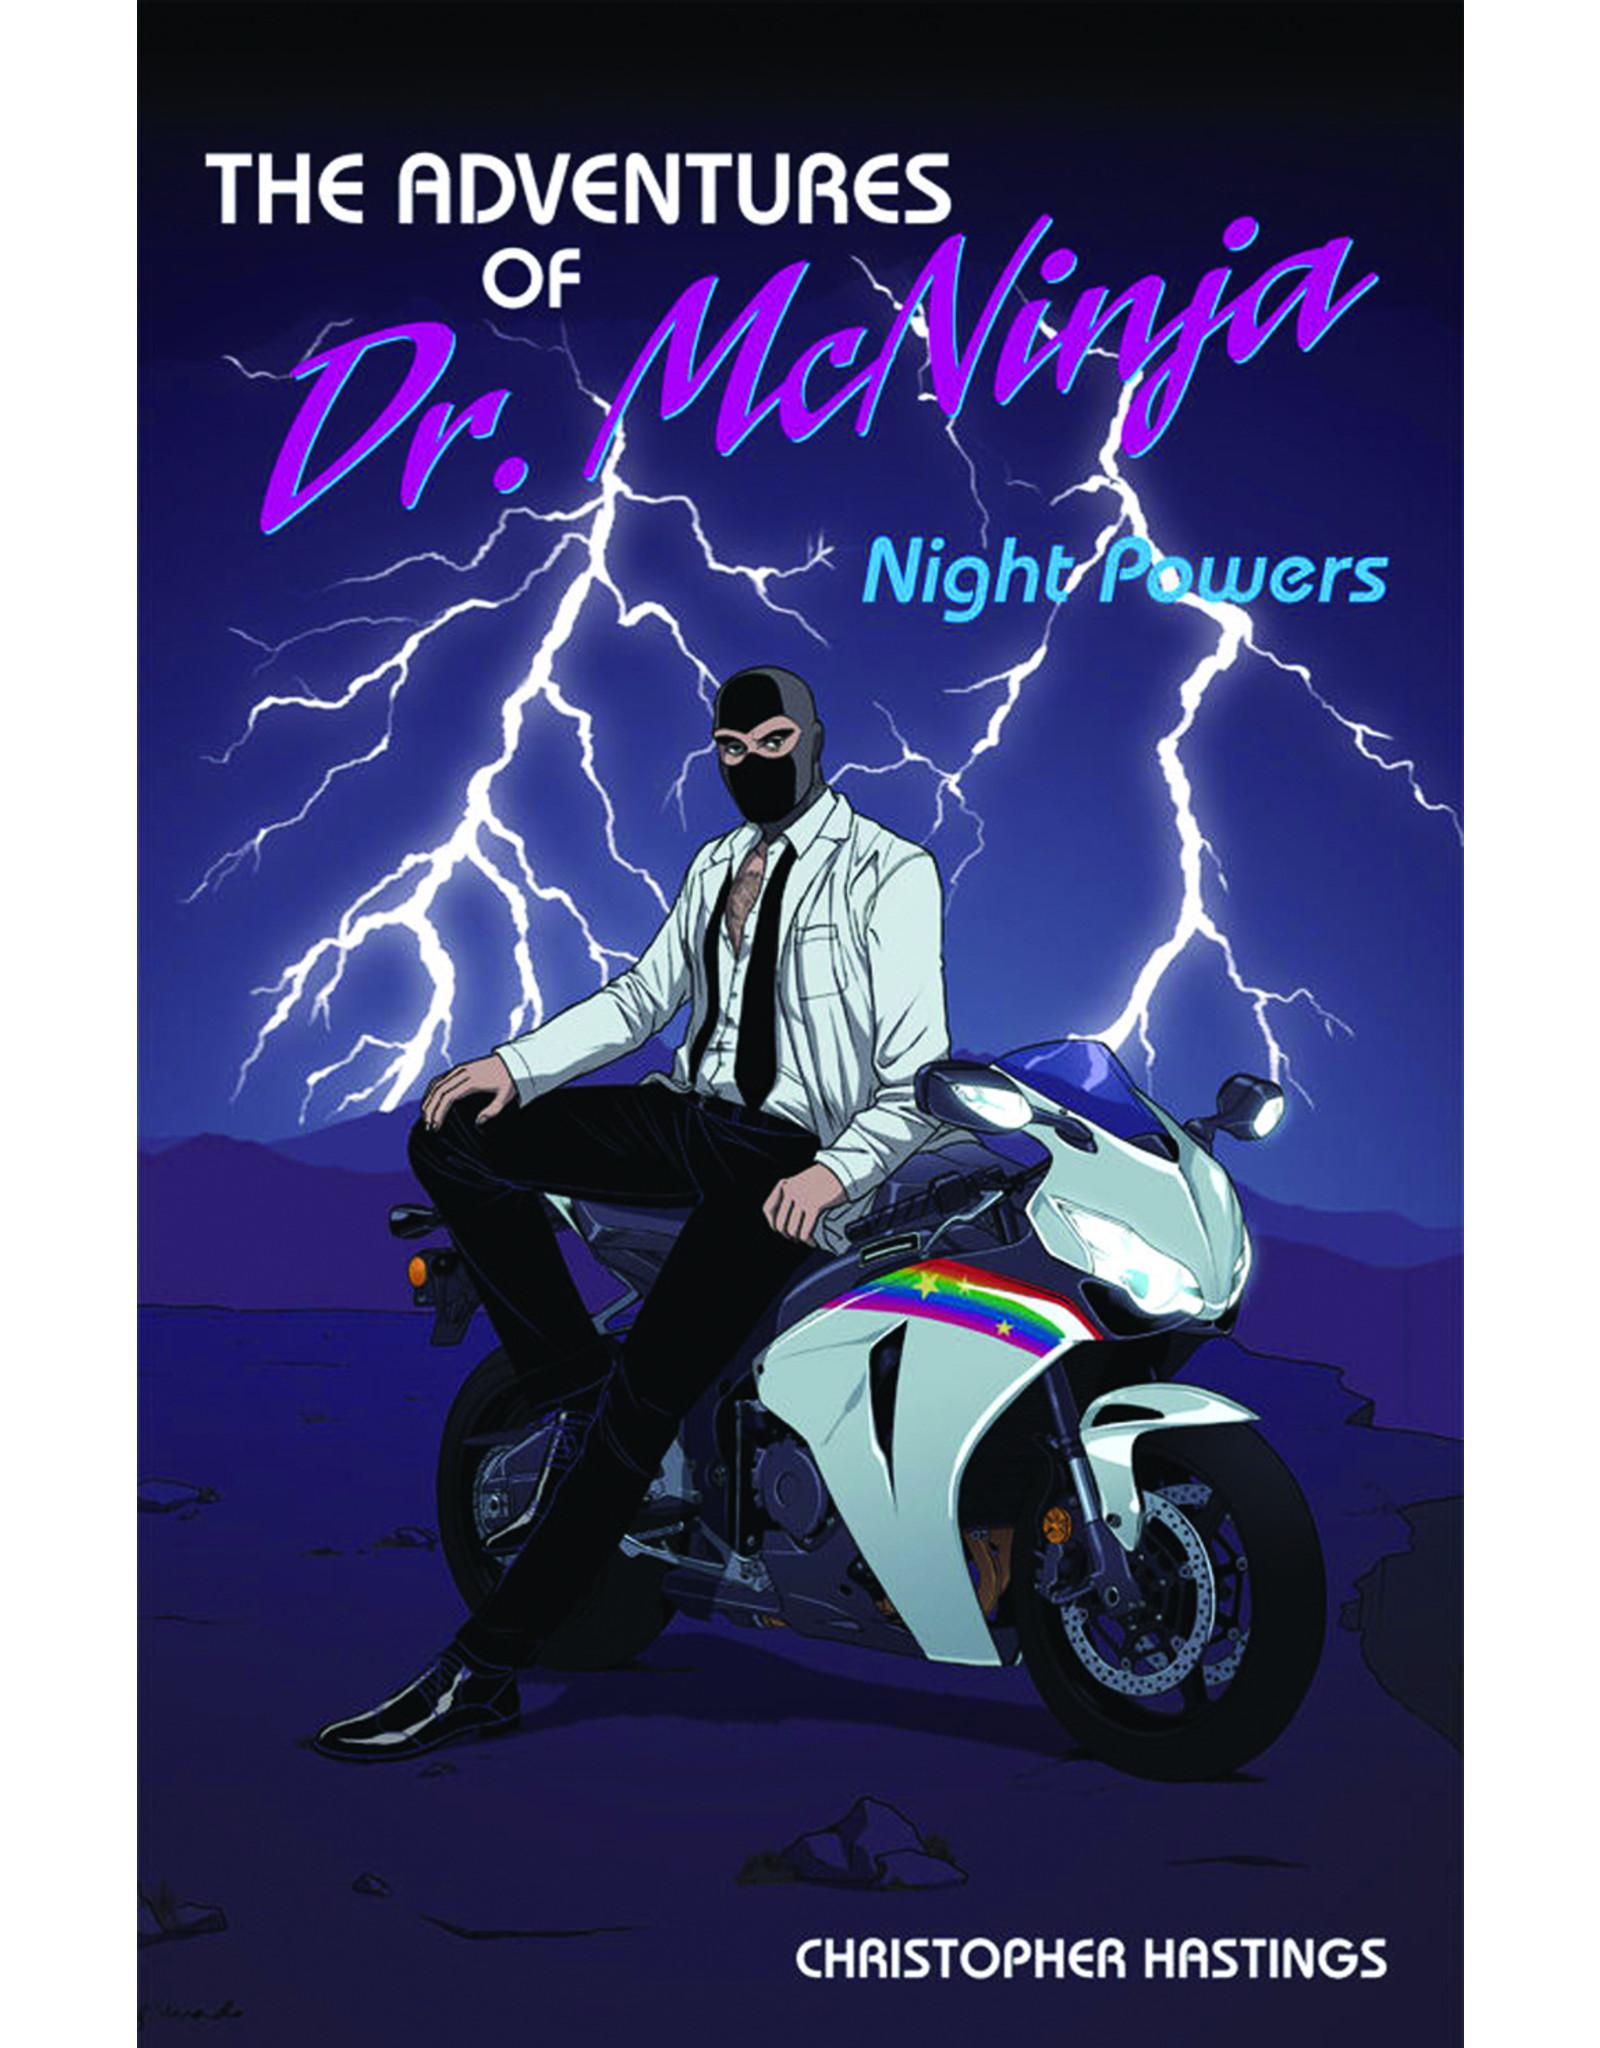 DARK HORSE COMICS ADV OF DR MCNINJA TP VOL 01 NIGHT POWERS